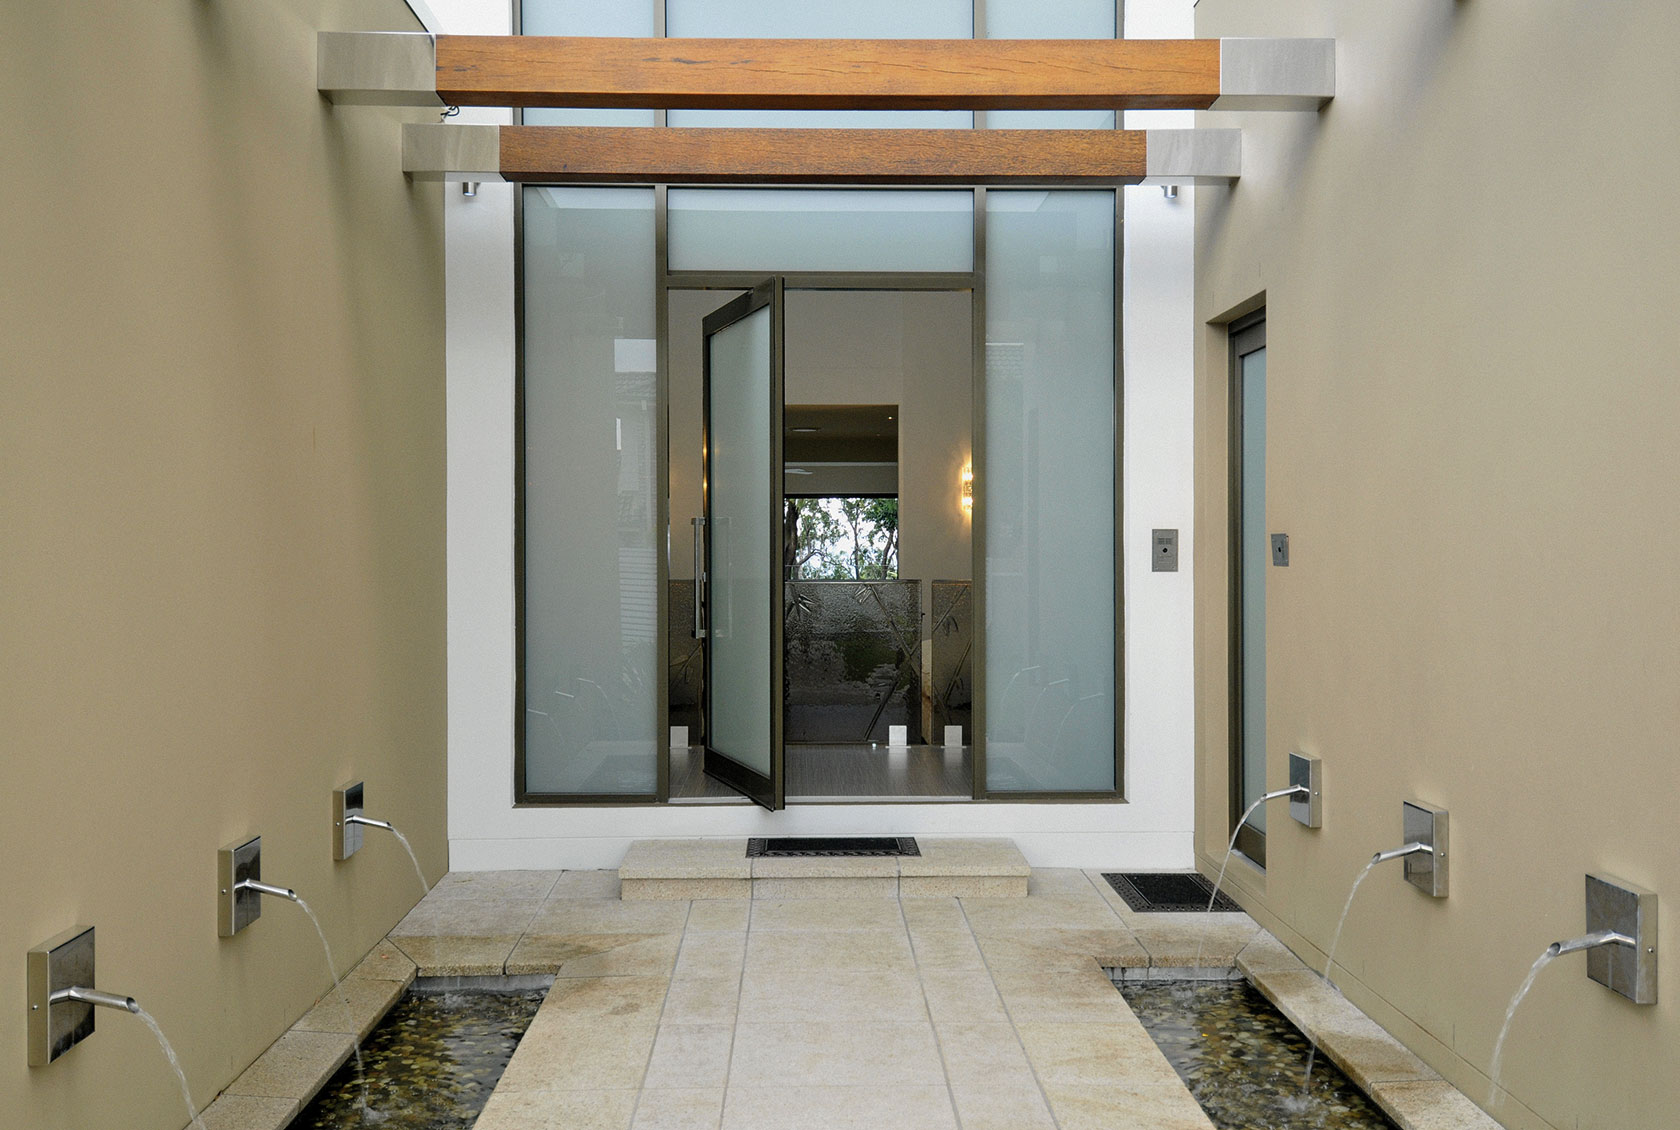 Aluminium Pivot Door with obscure glass